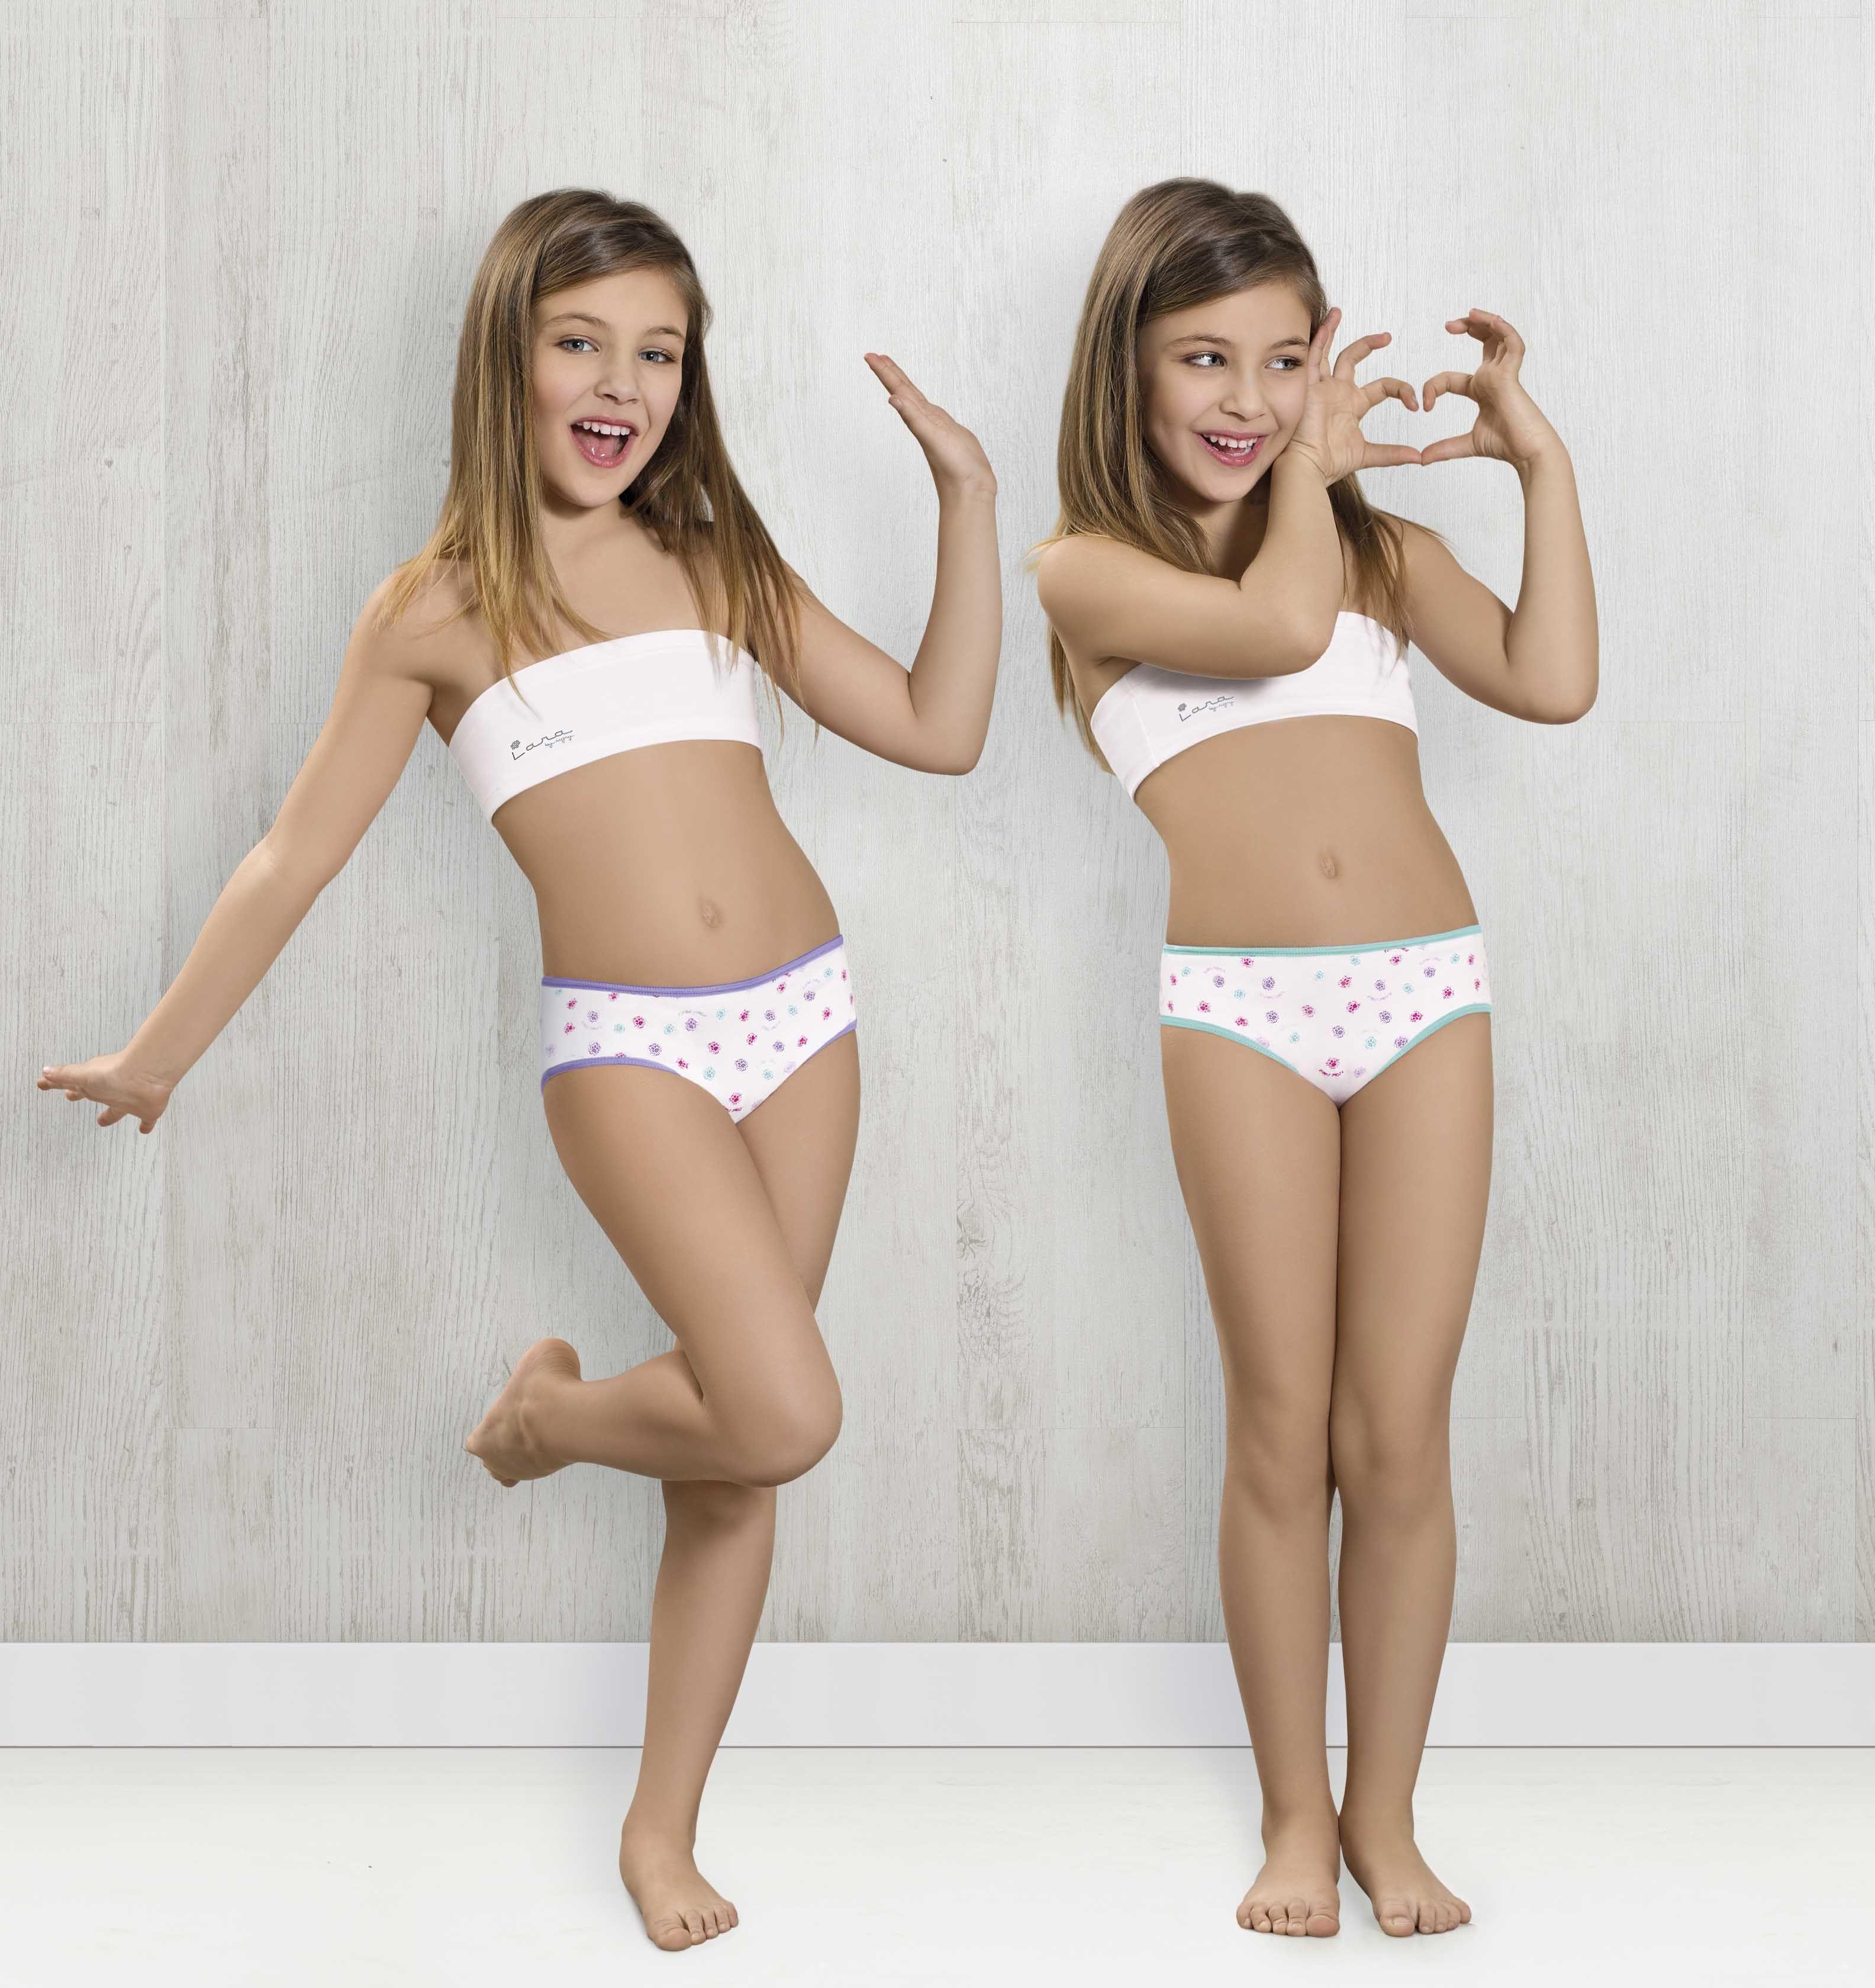 2 young bikini girls sucking my cock together 9